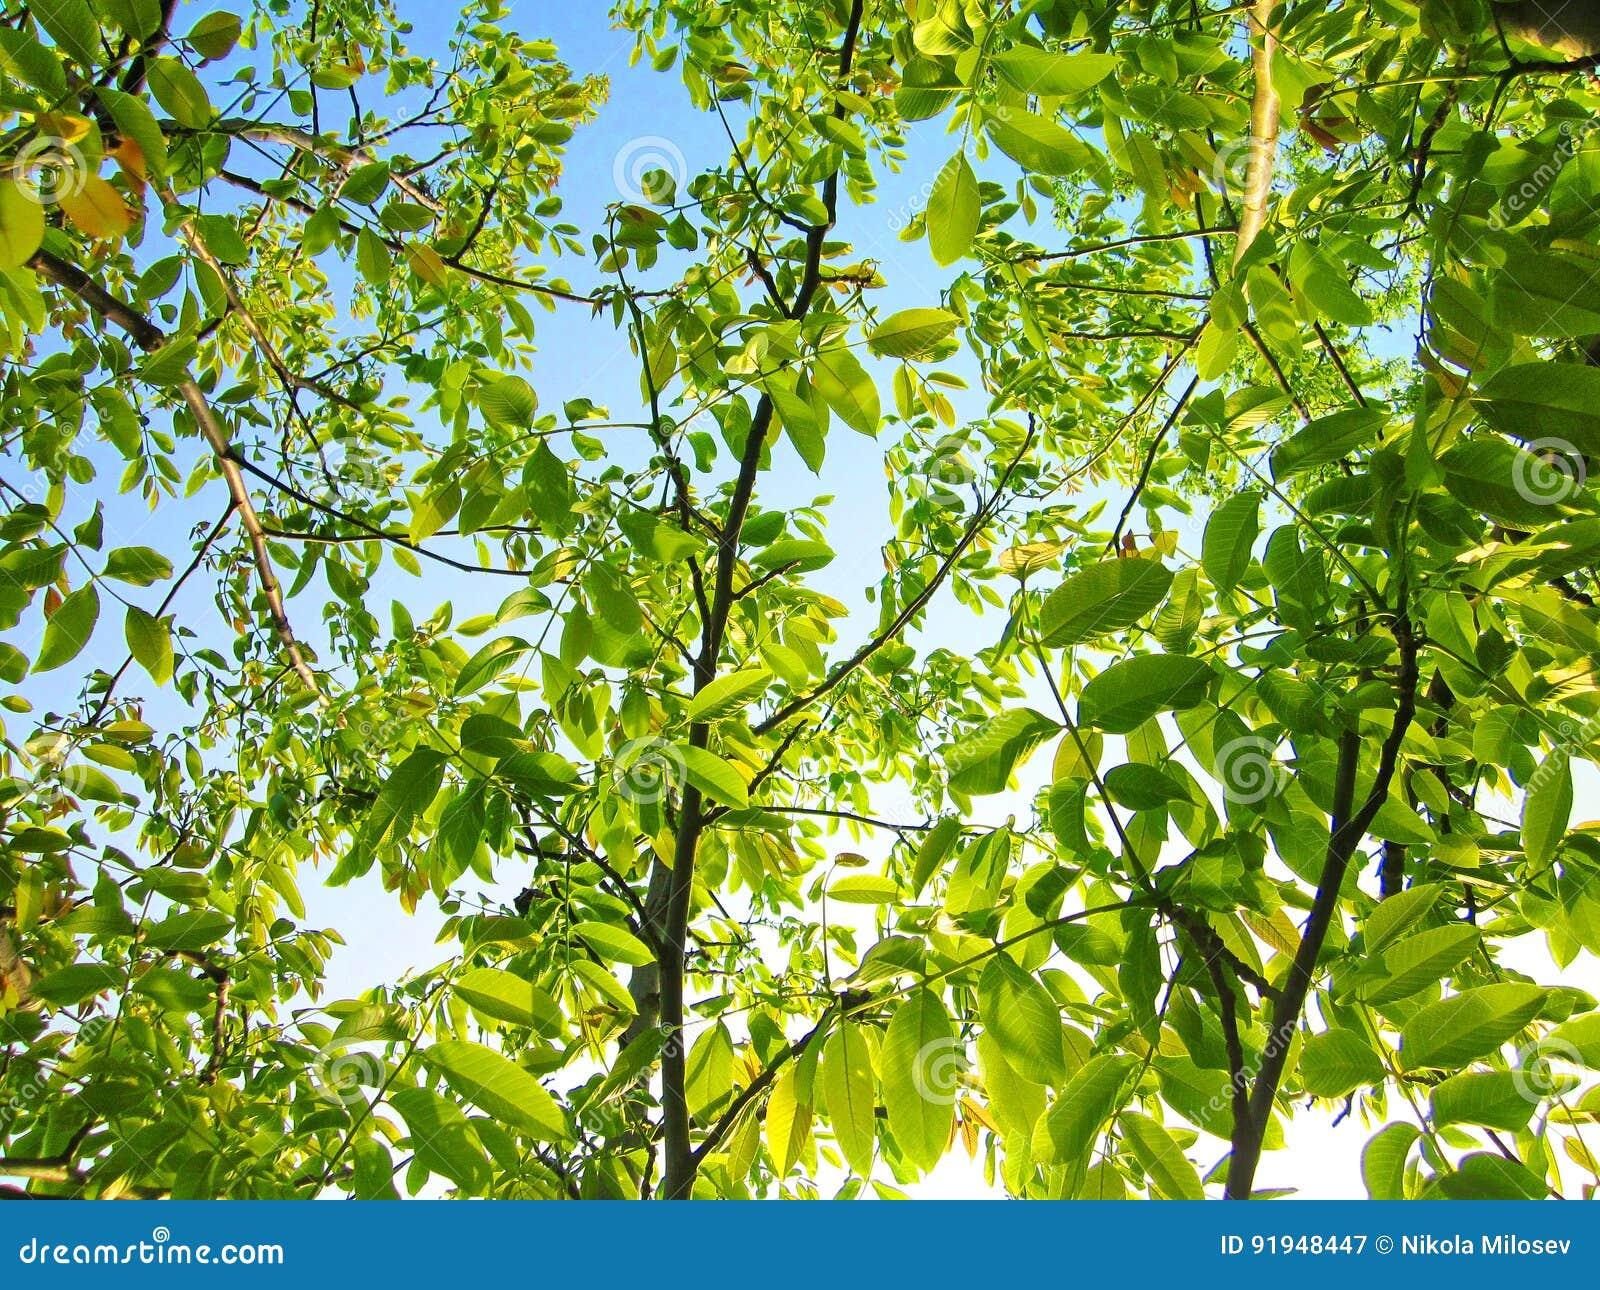 Walnut tree branches